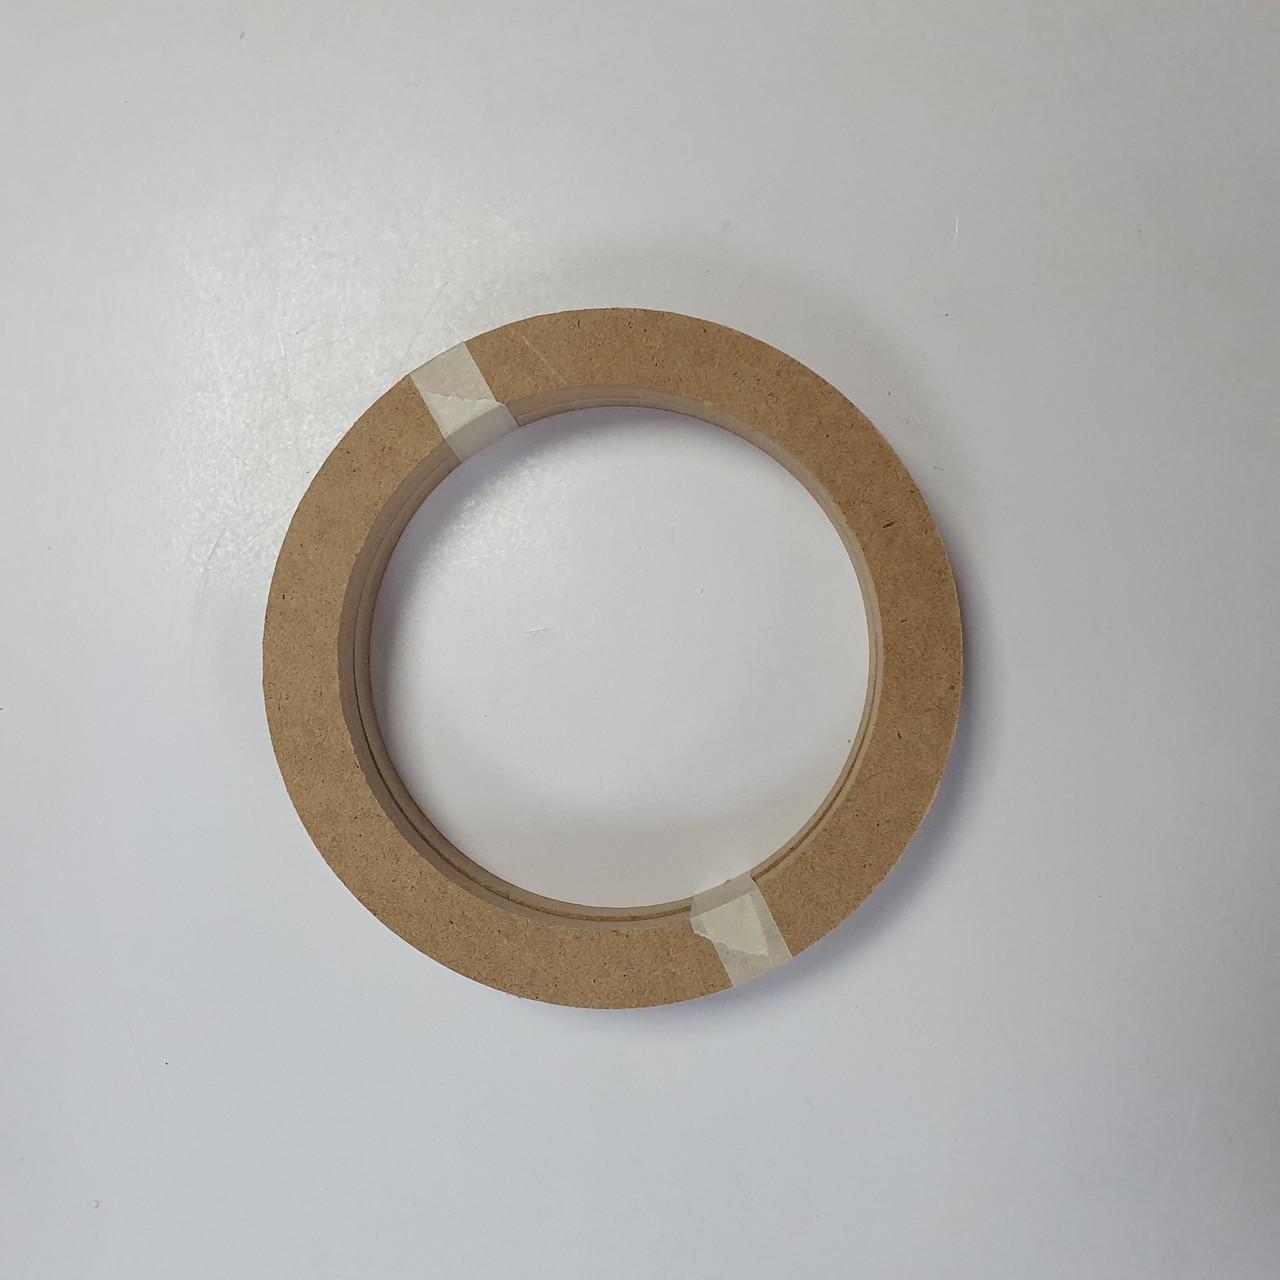 Кольцо №2 (16-ые Стандарные без бортика)